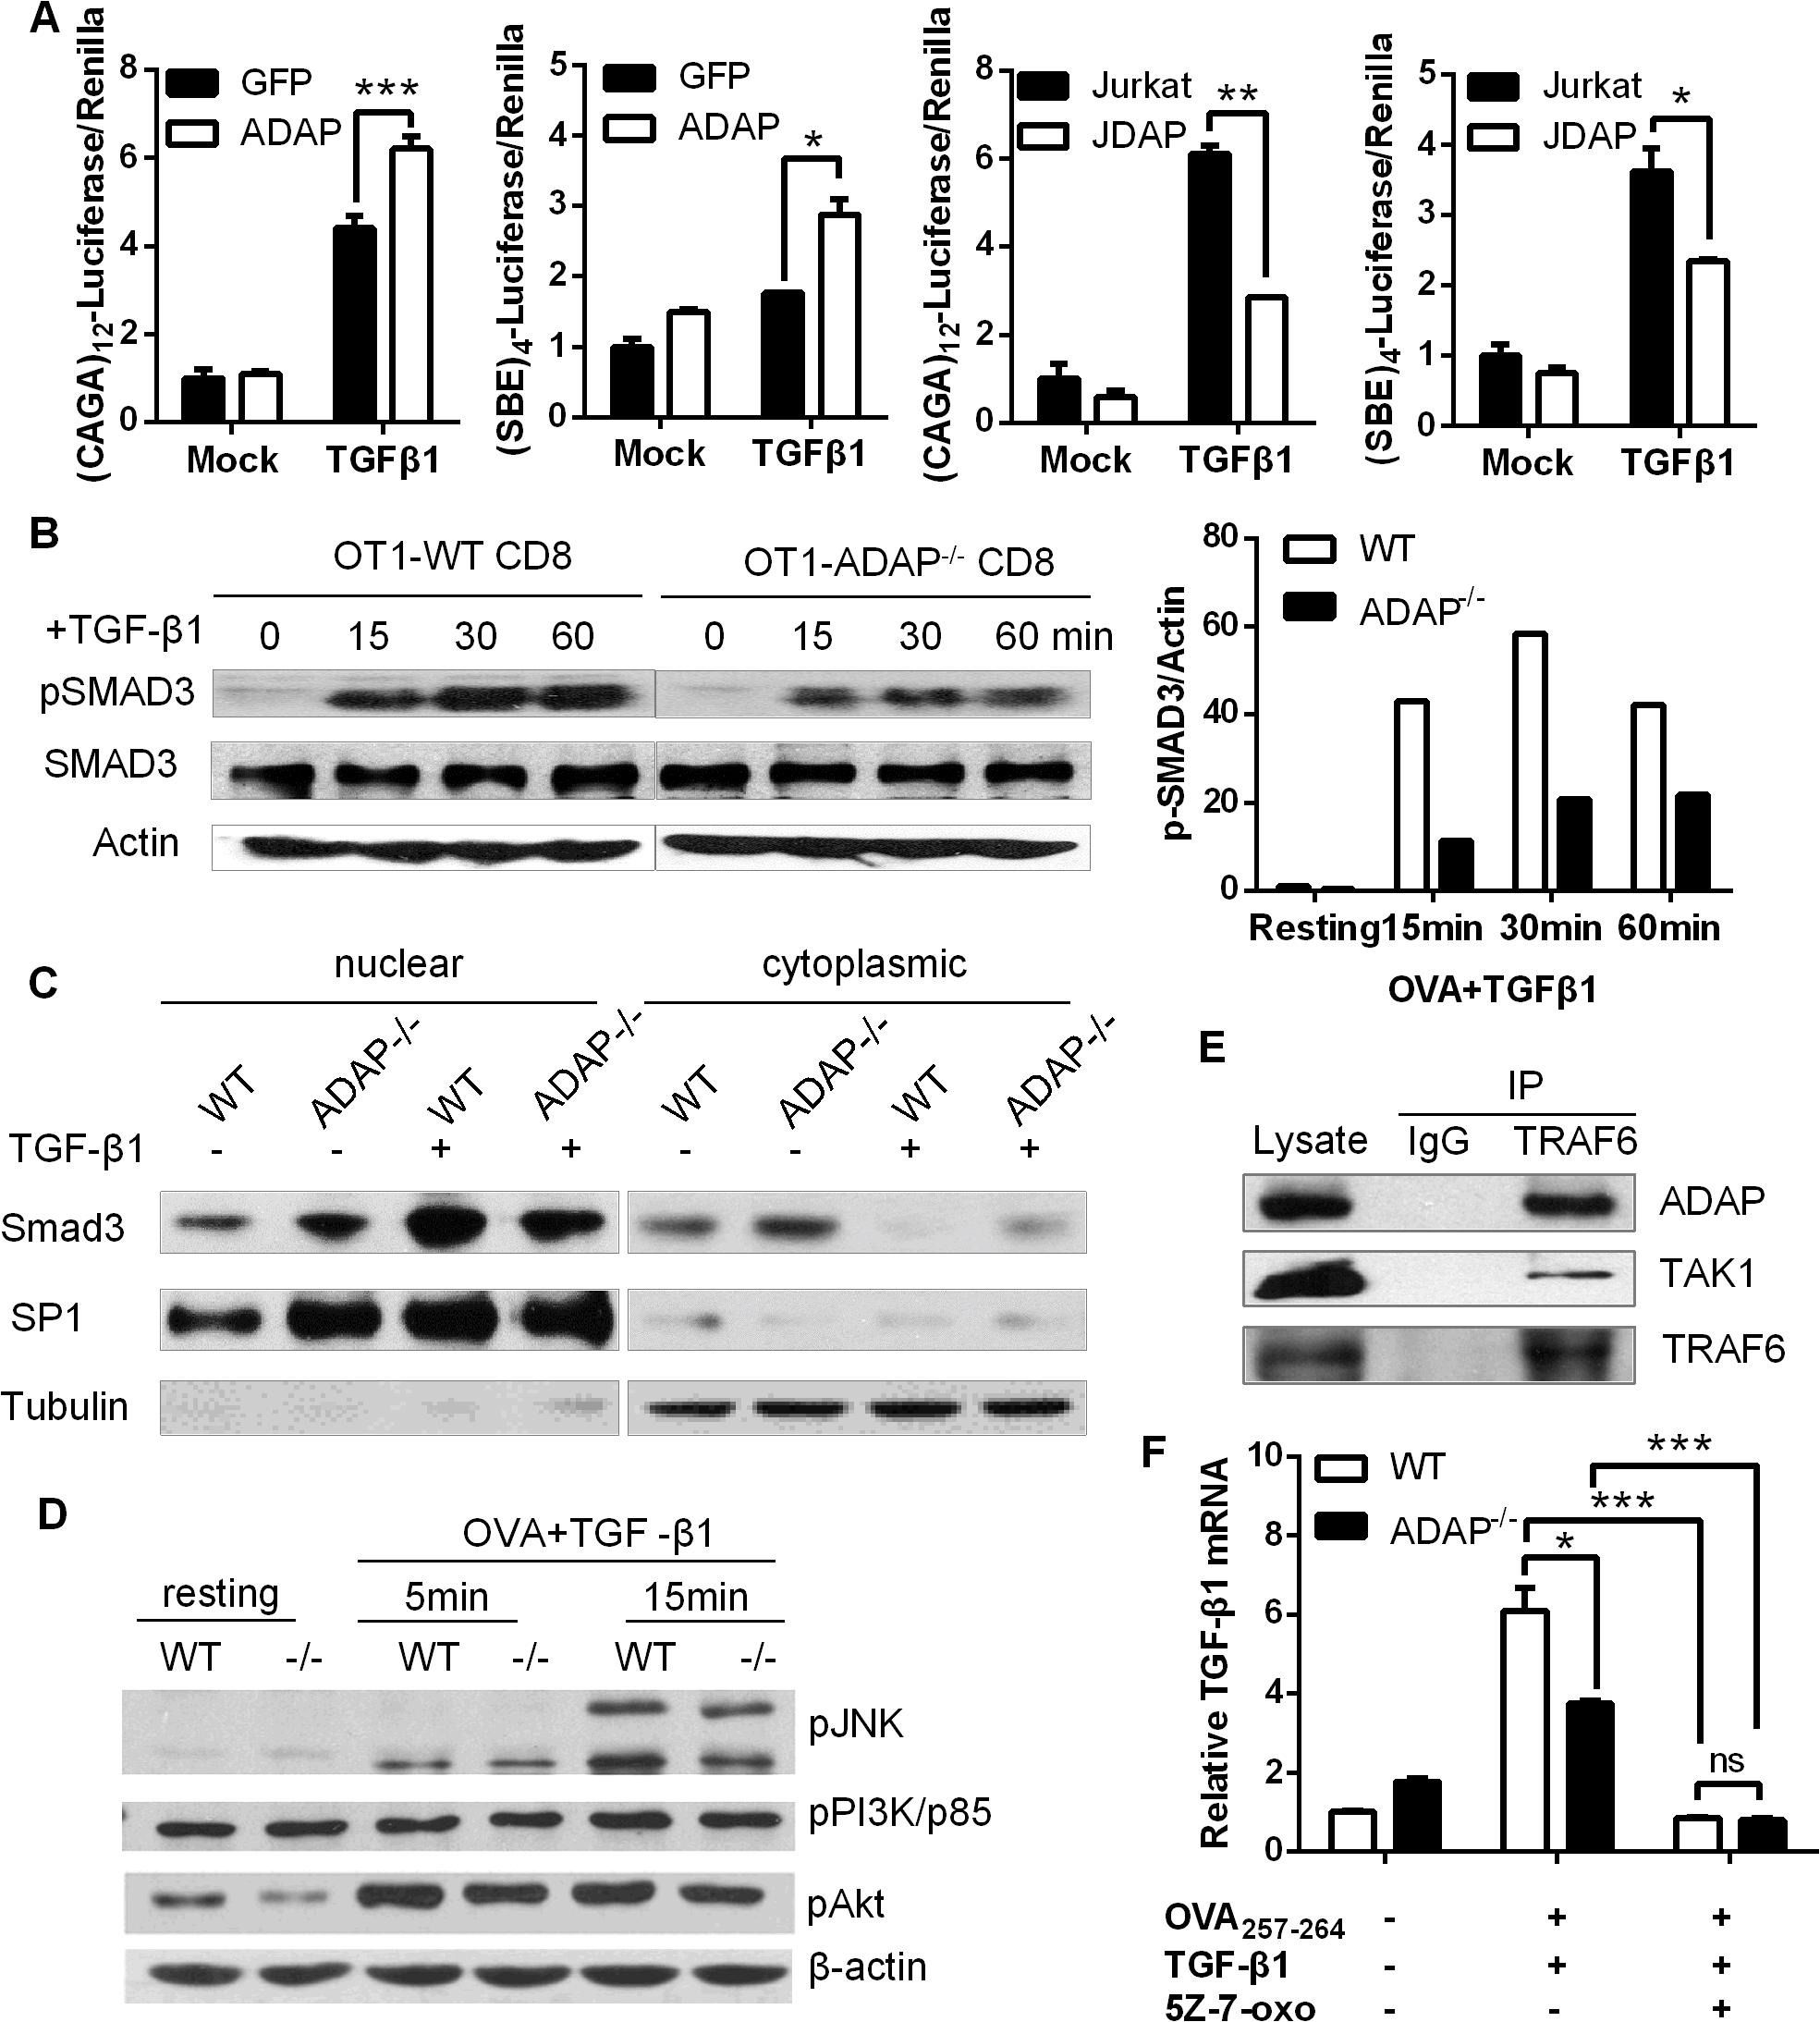 ADAP enhances TGF-β1/TβRI signaling via TRAF6-TAK1-SMAD3.